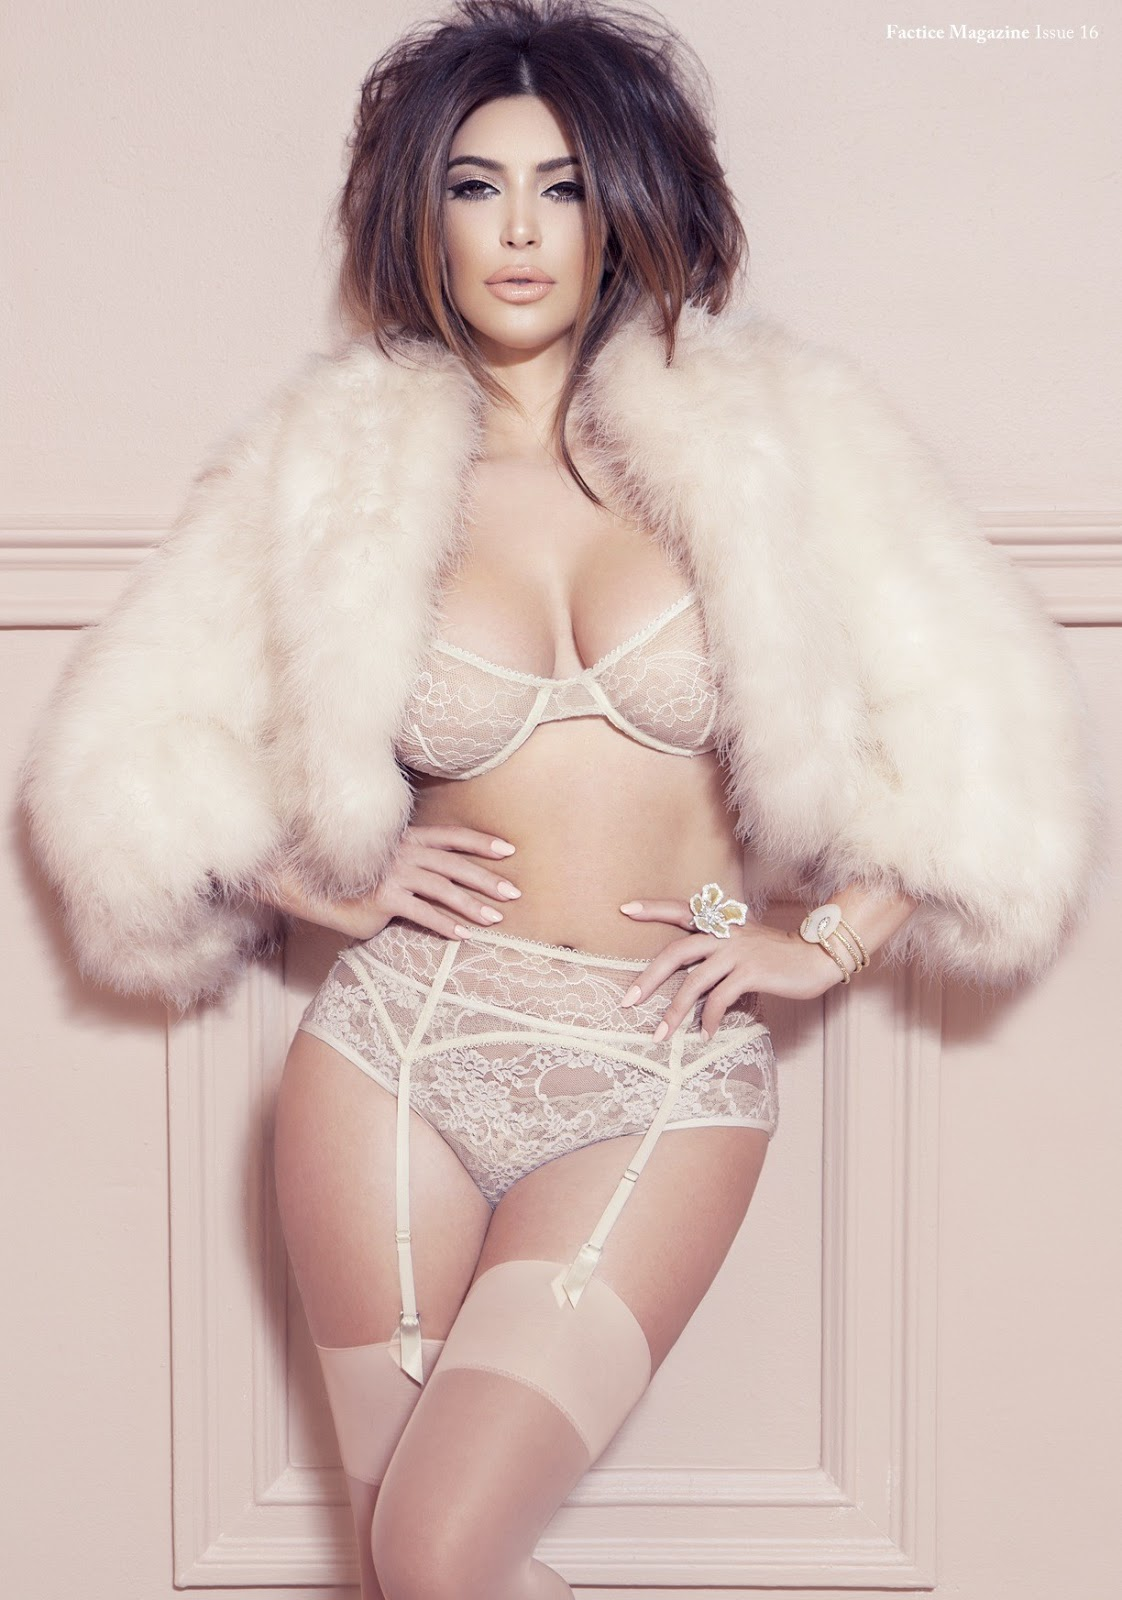 http://2.bp.blogspot.com/-BZCkJs-Ko8Y/UMmFxB9DoyI/AAAAAAABgQo/K3H7X39PQ1k/s1600/Kim-Kardashian-22.jpg